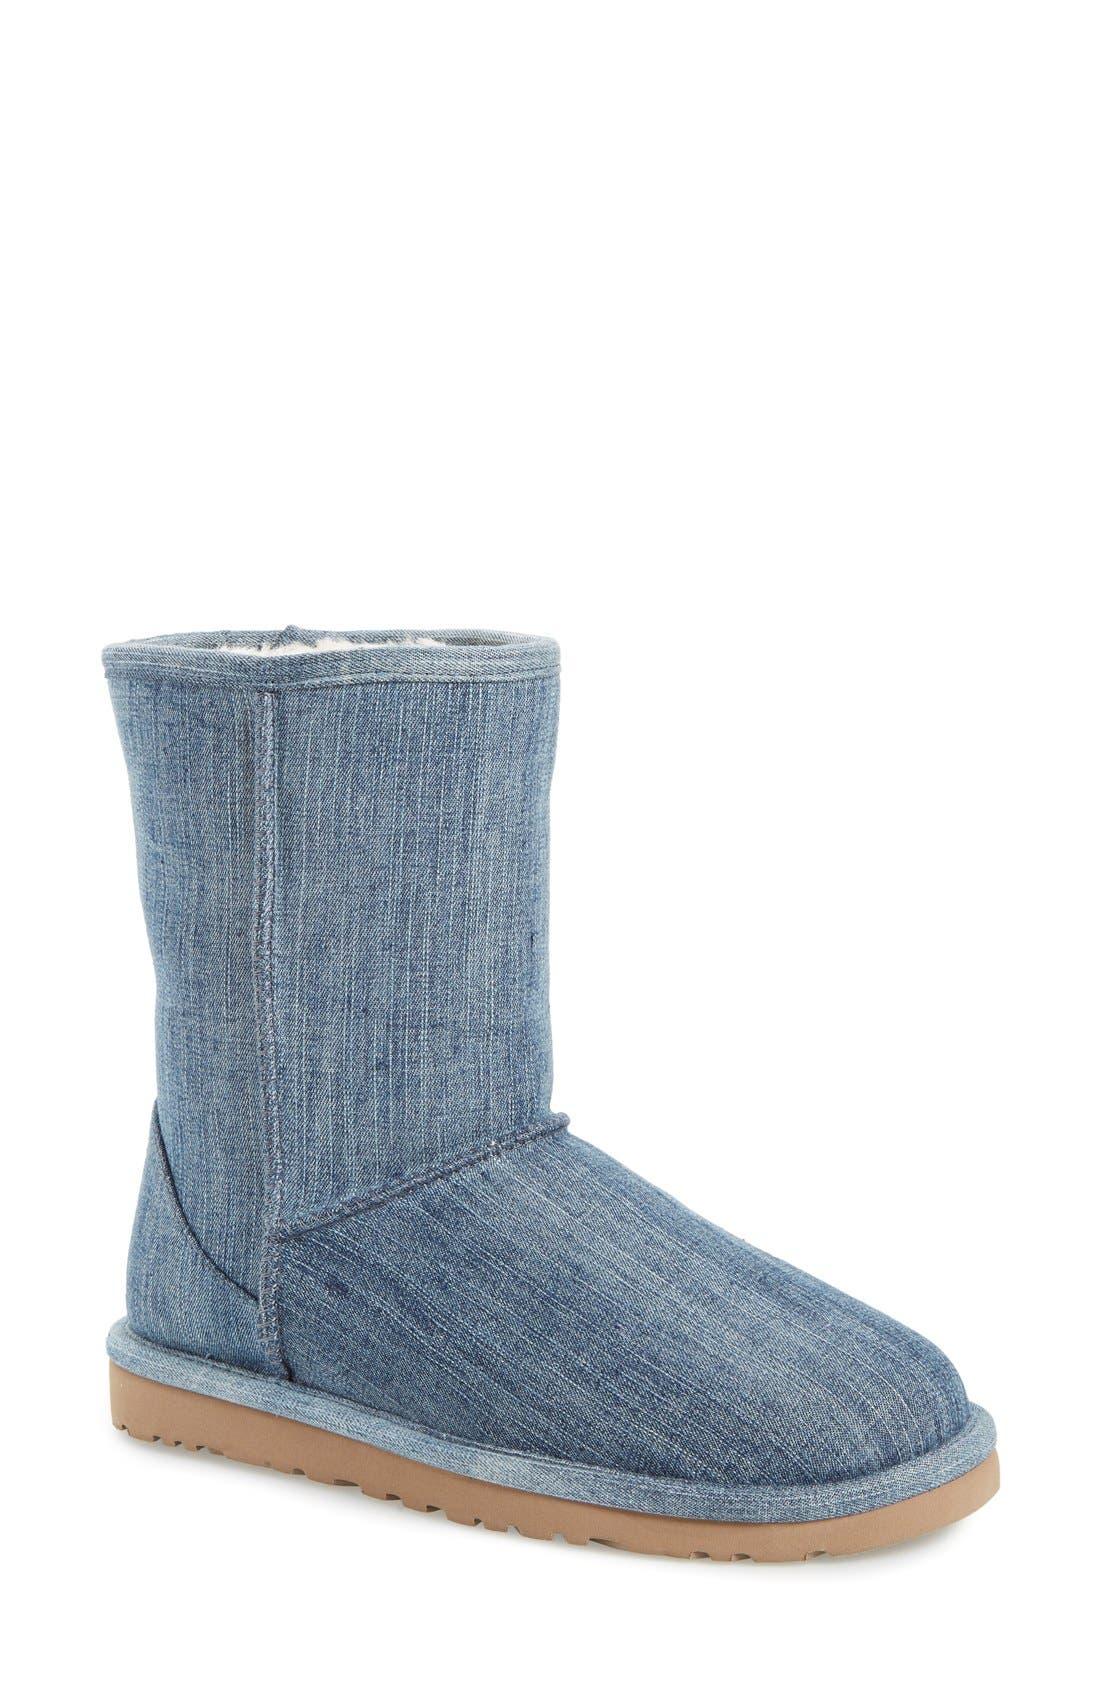 Alternate Image 1 Selected - UGG® 'Classic Short' Denim Boot (Women)